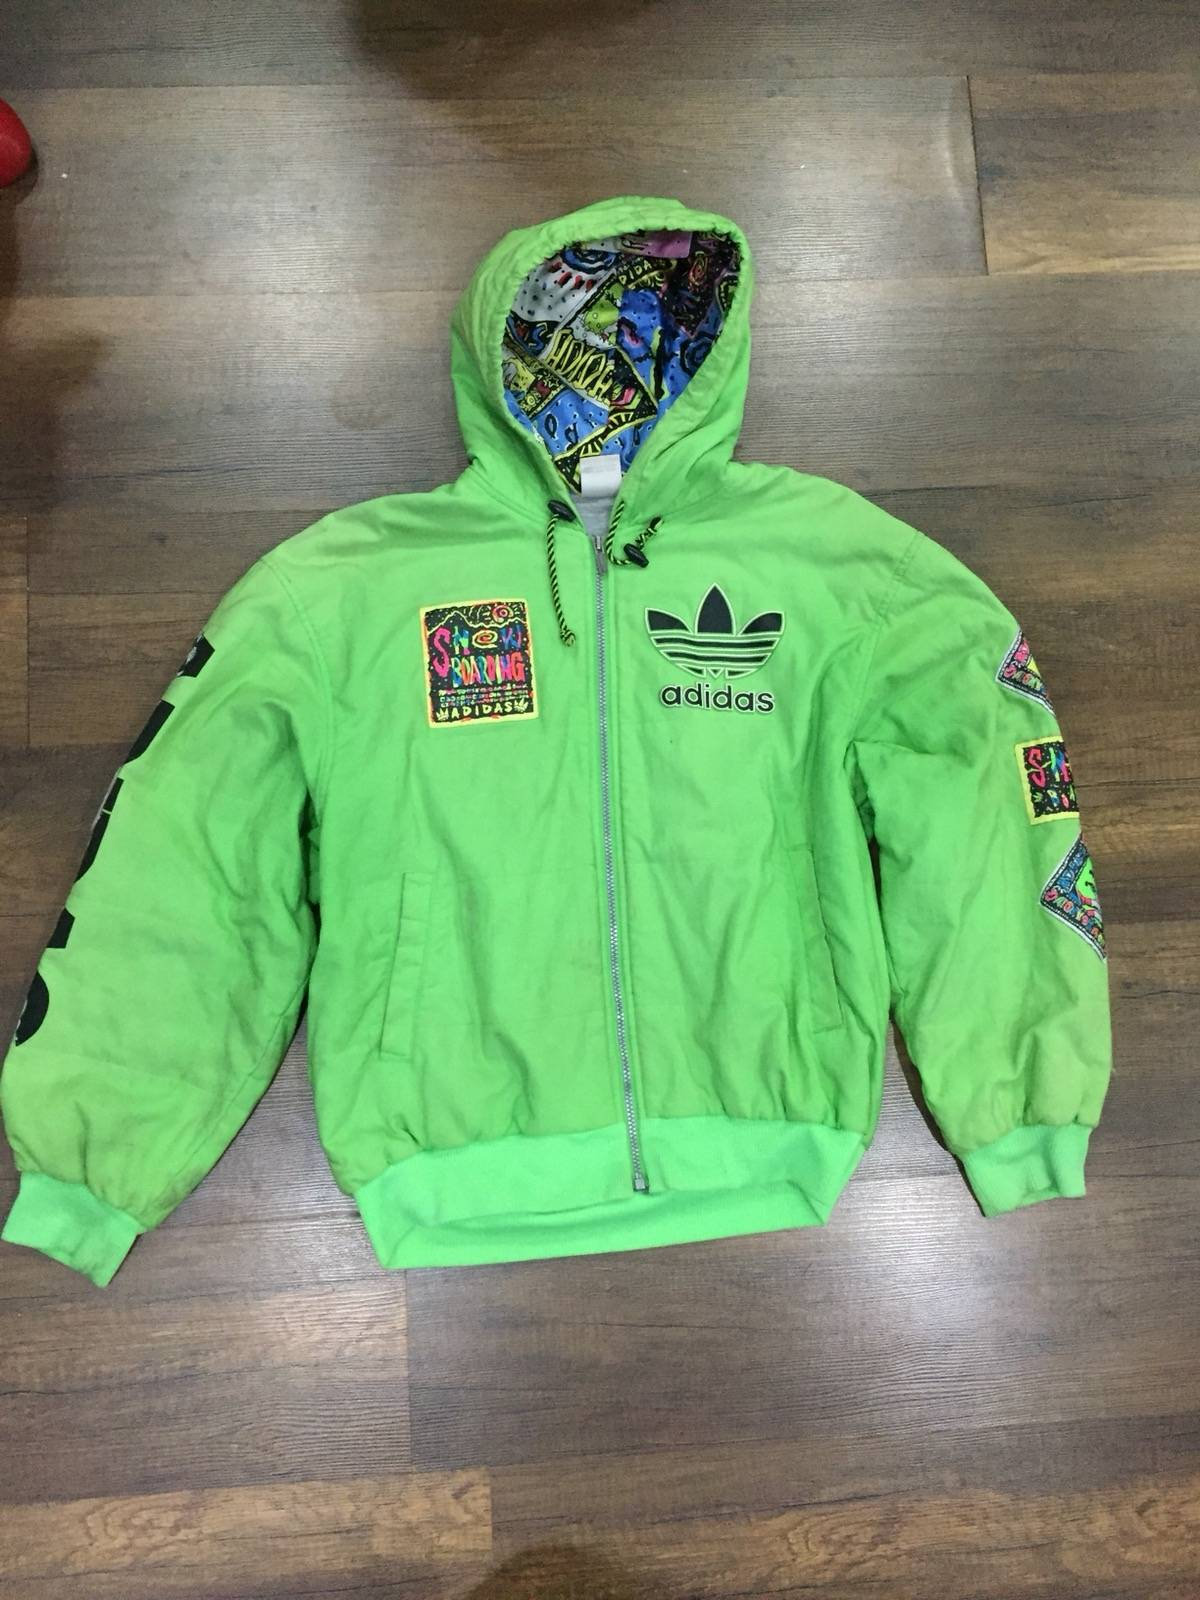 90s Vintage Mens ADIDAS ORIGINALS Pullover Jacket A6315